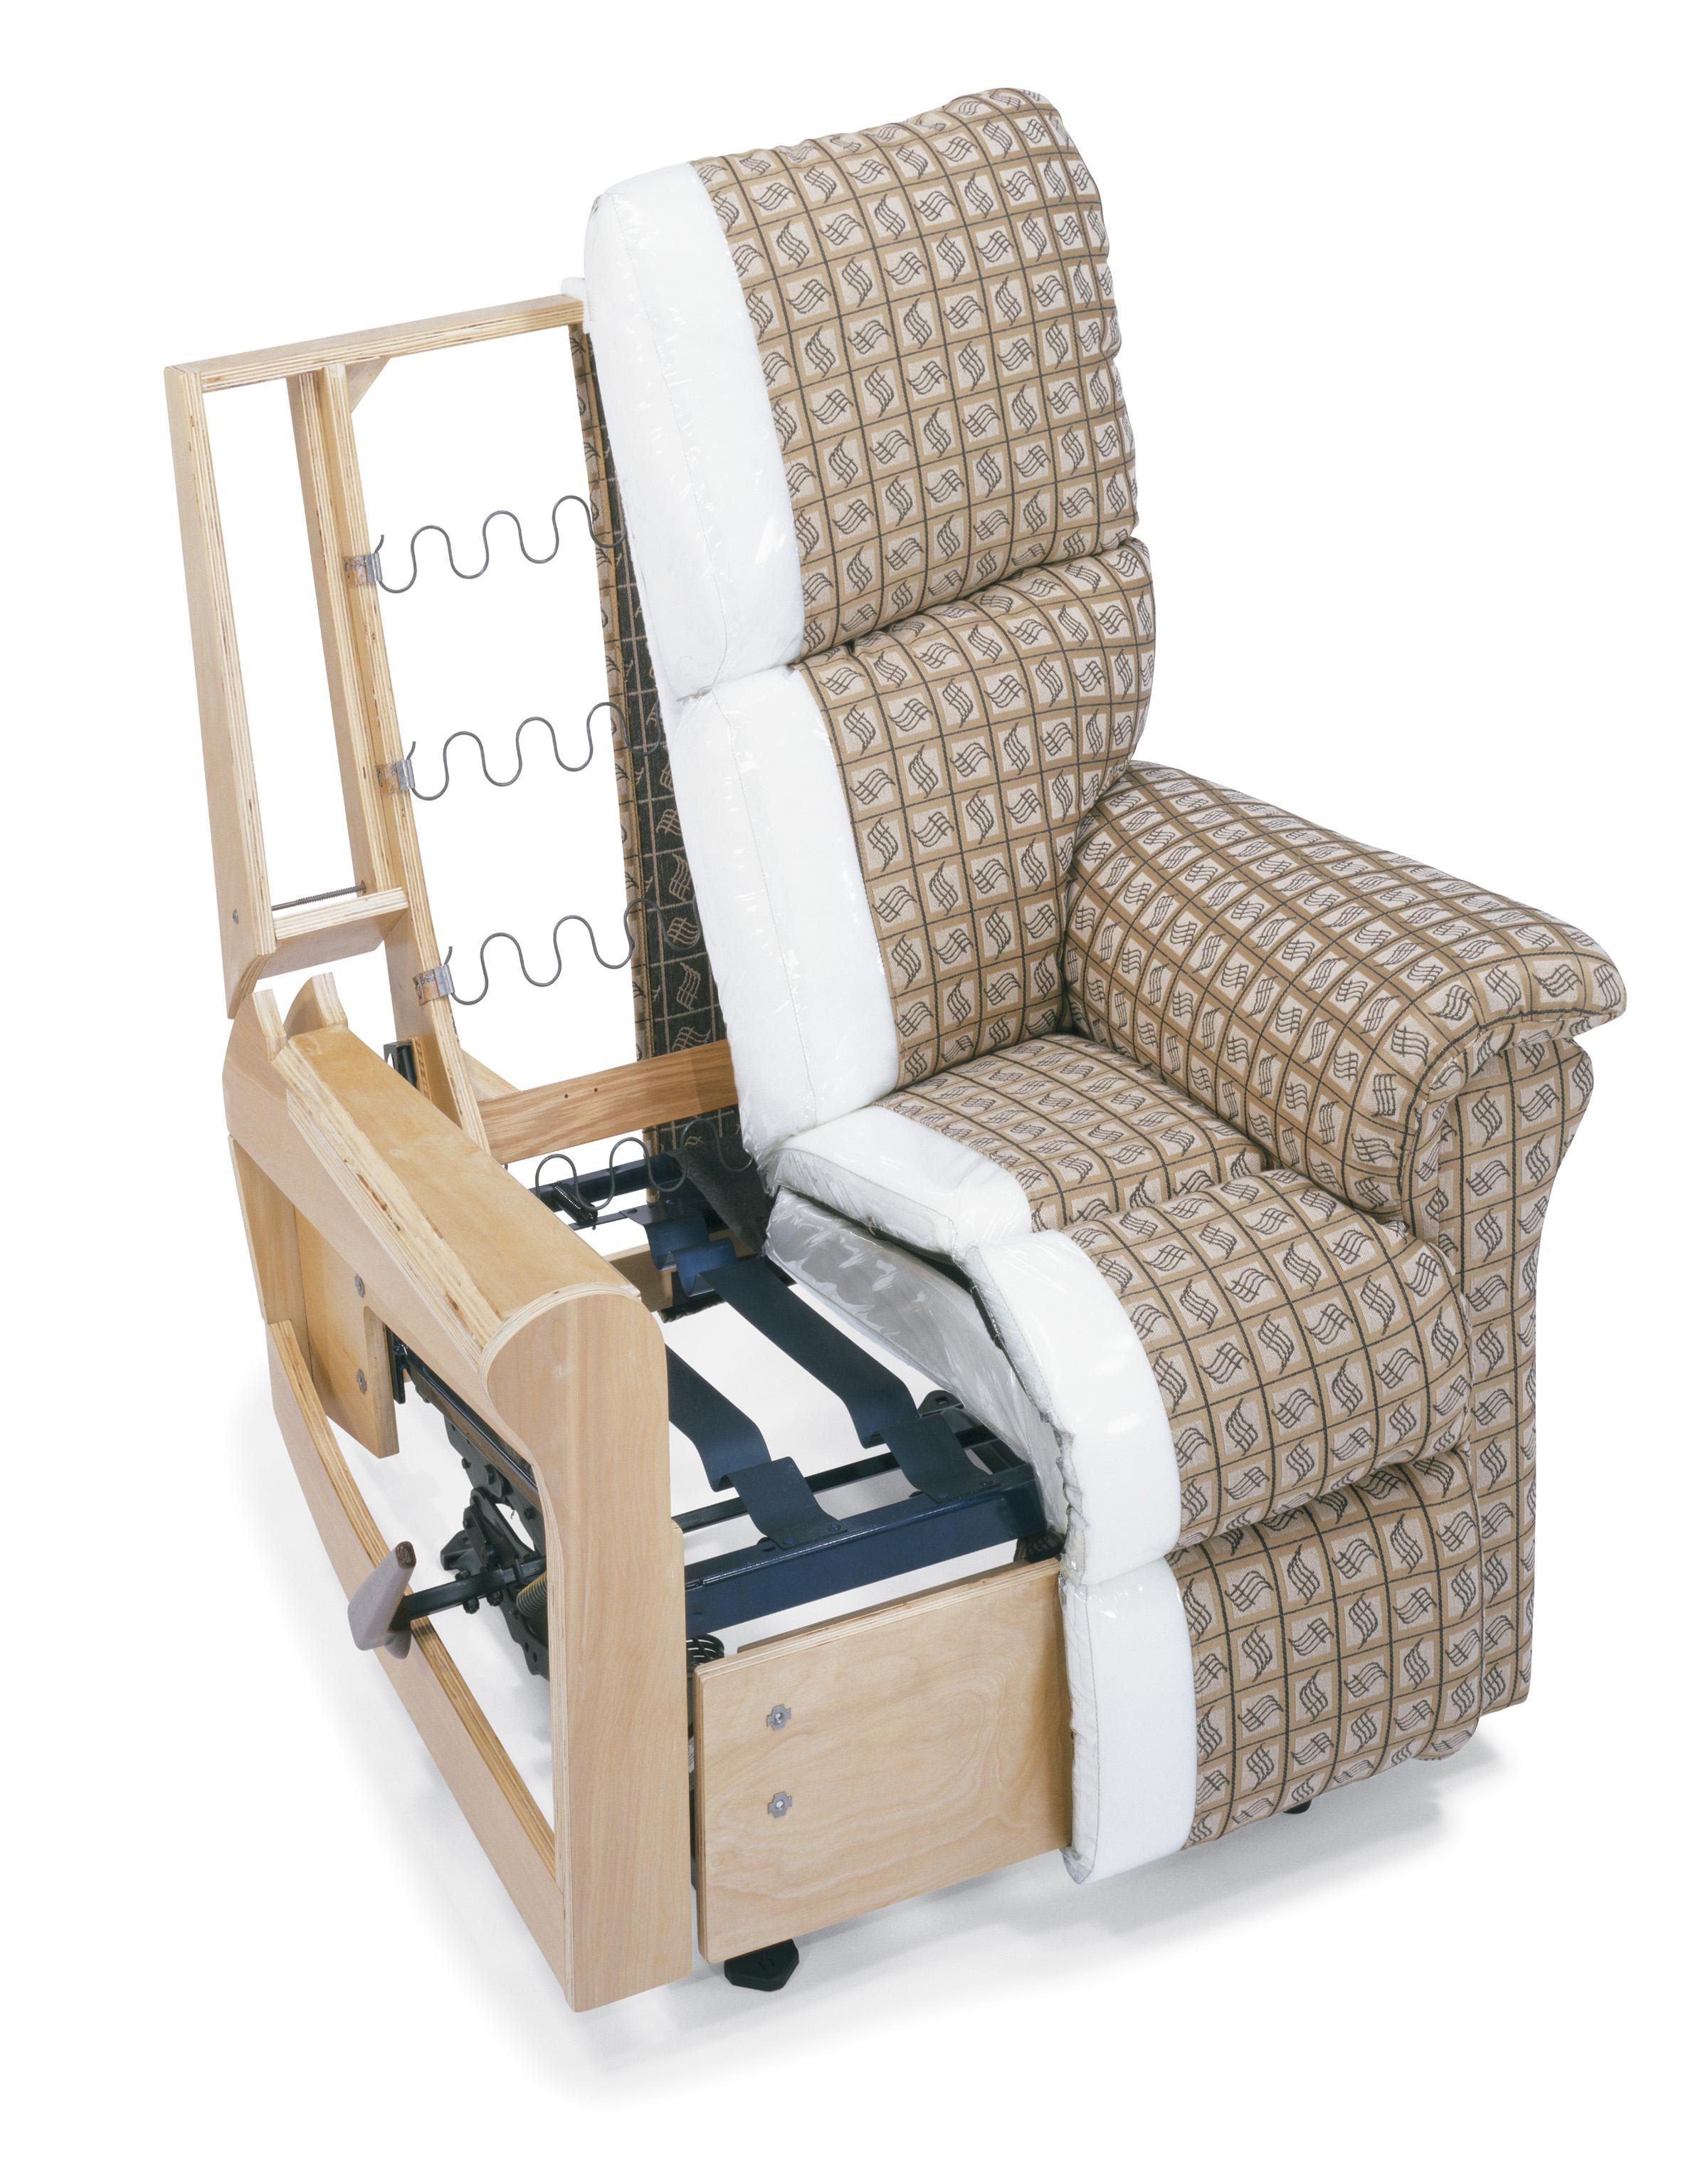 flexsteel julio reclining sofa boconcept carlton gebraucht recliners fleet street